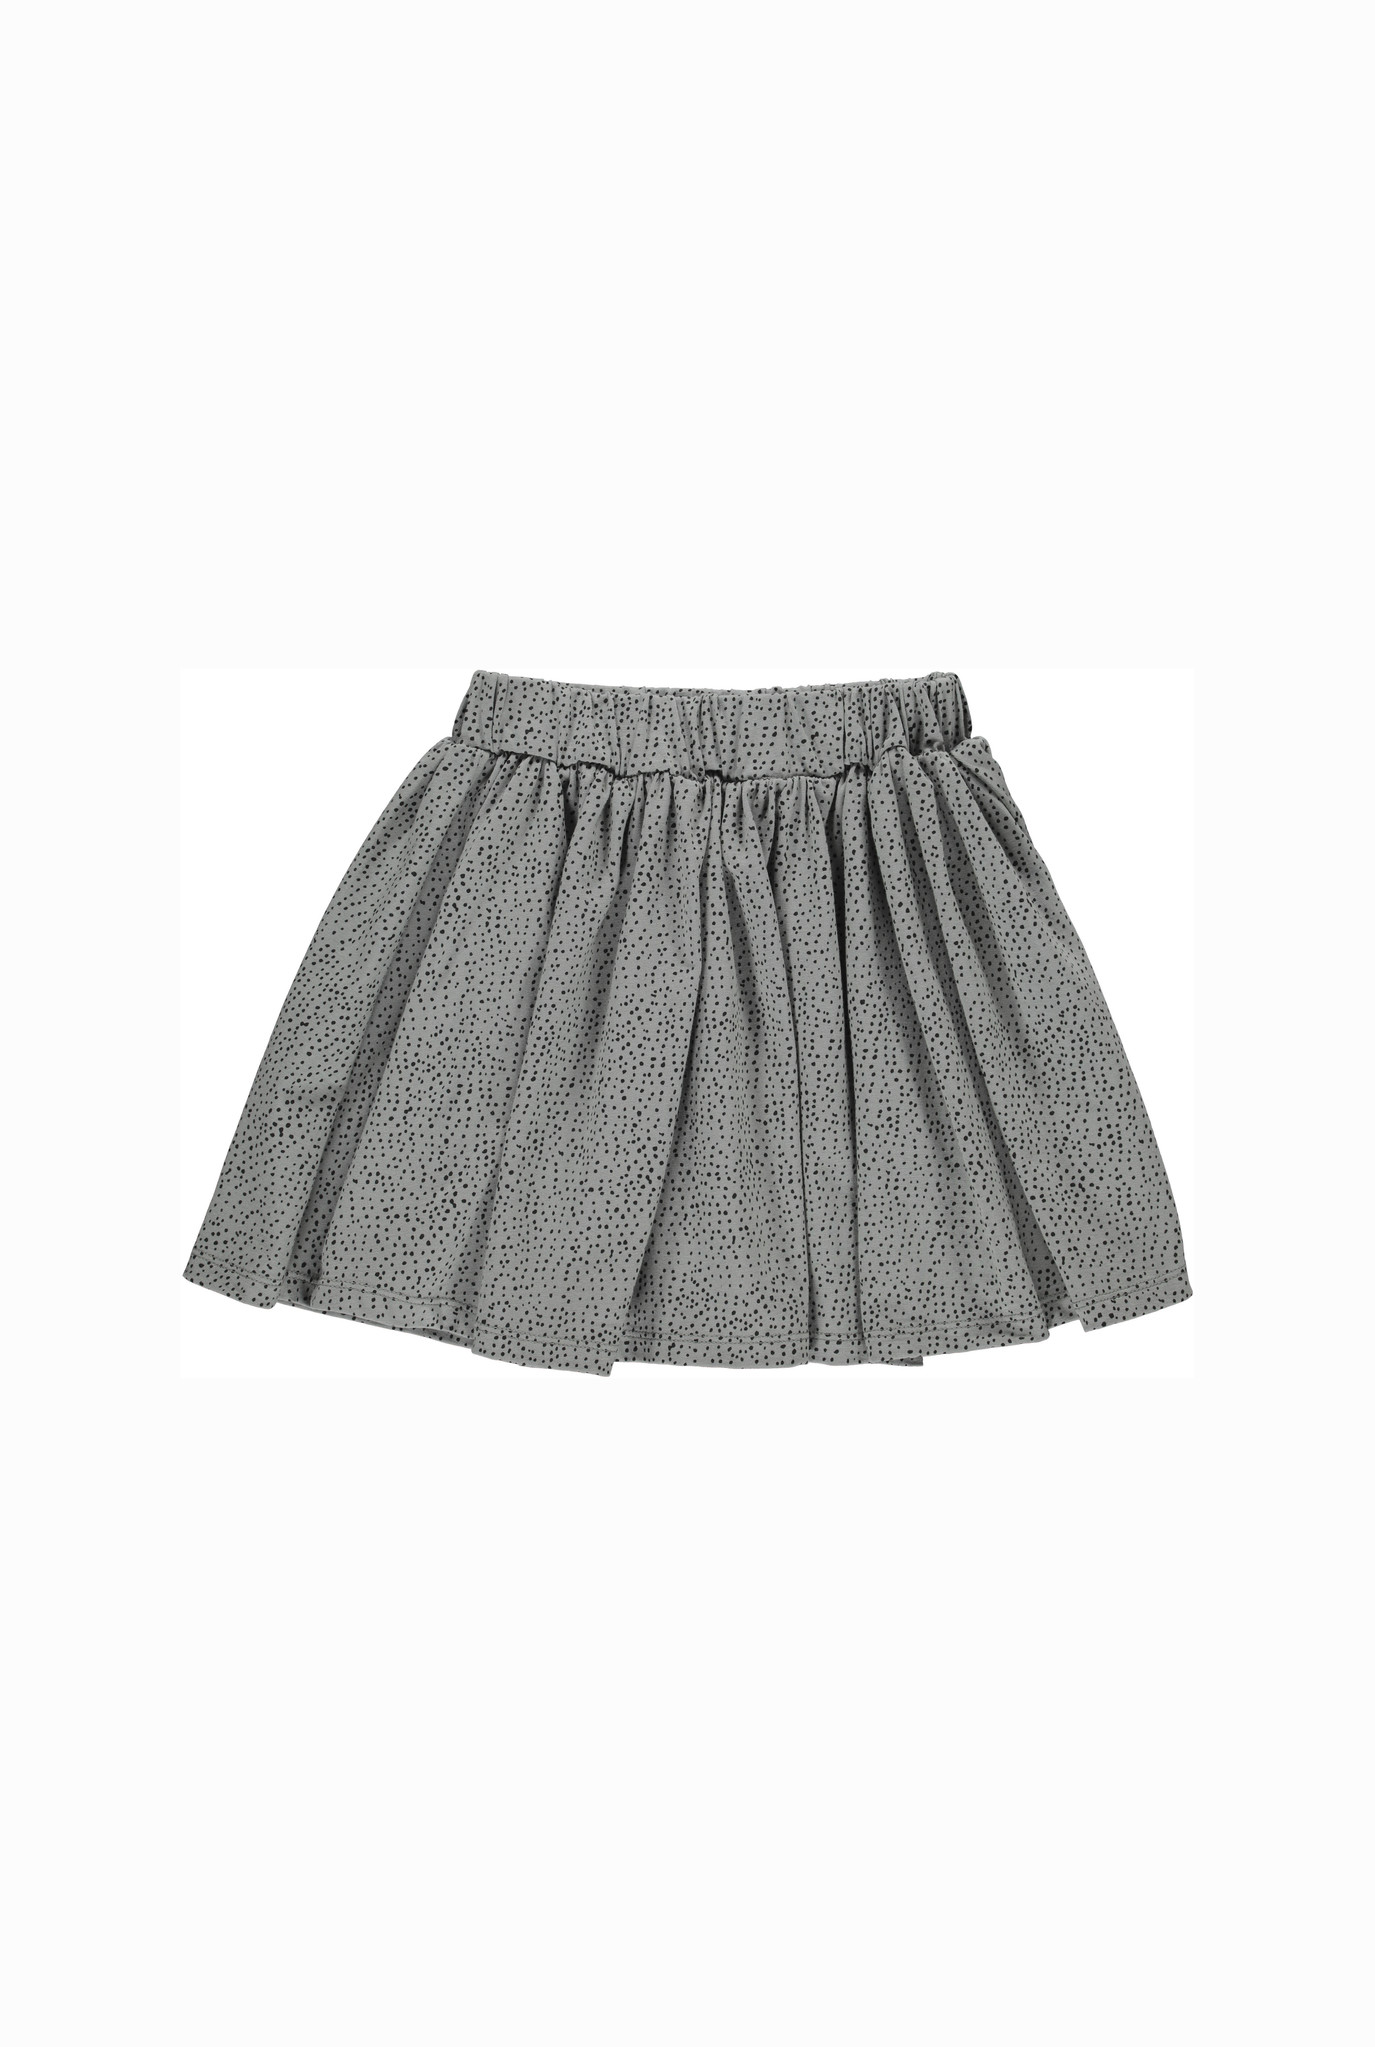 Skirt aesthetic dots - shadow